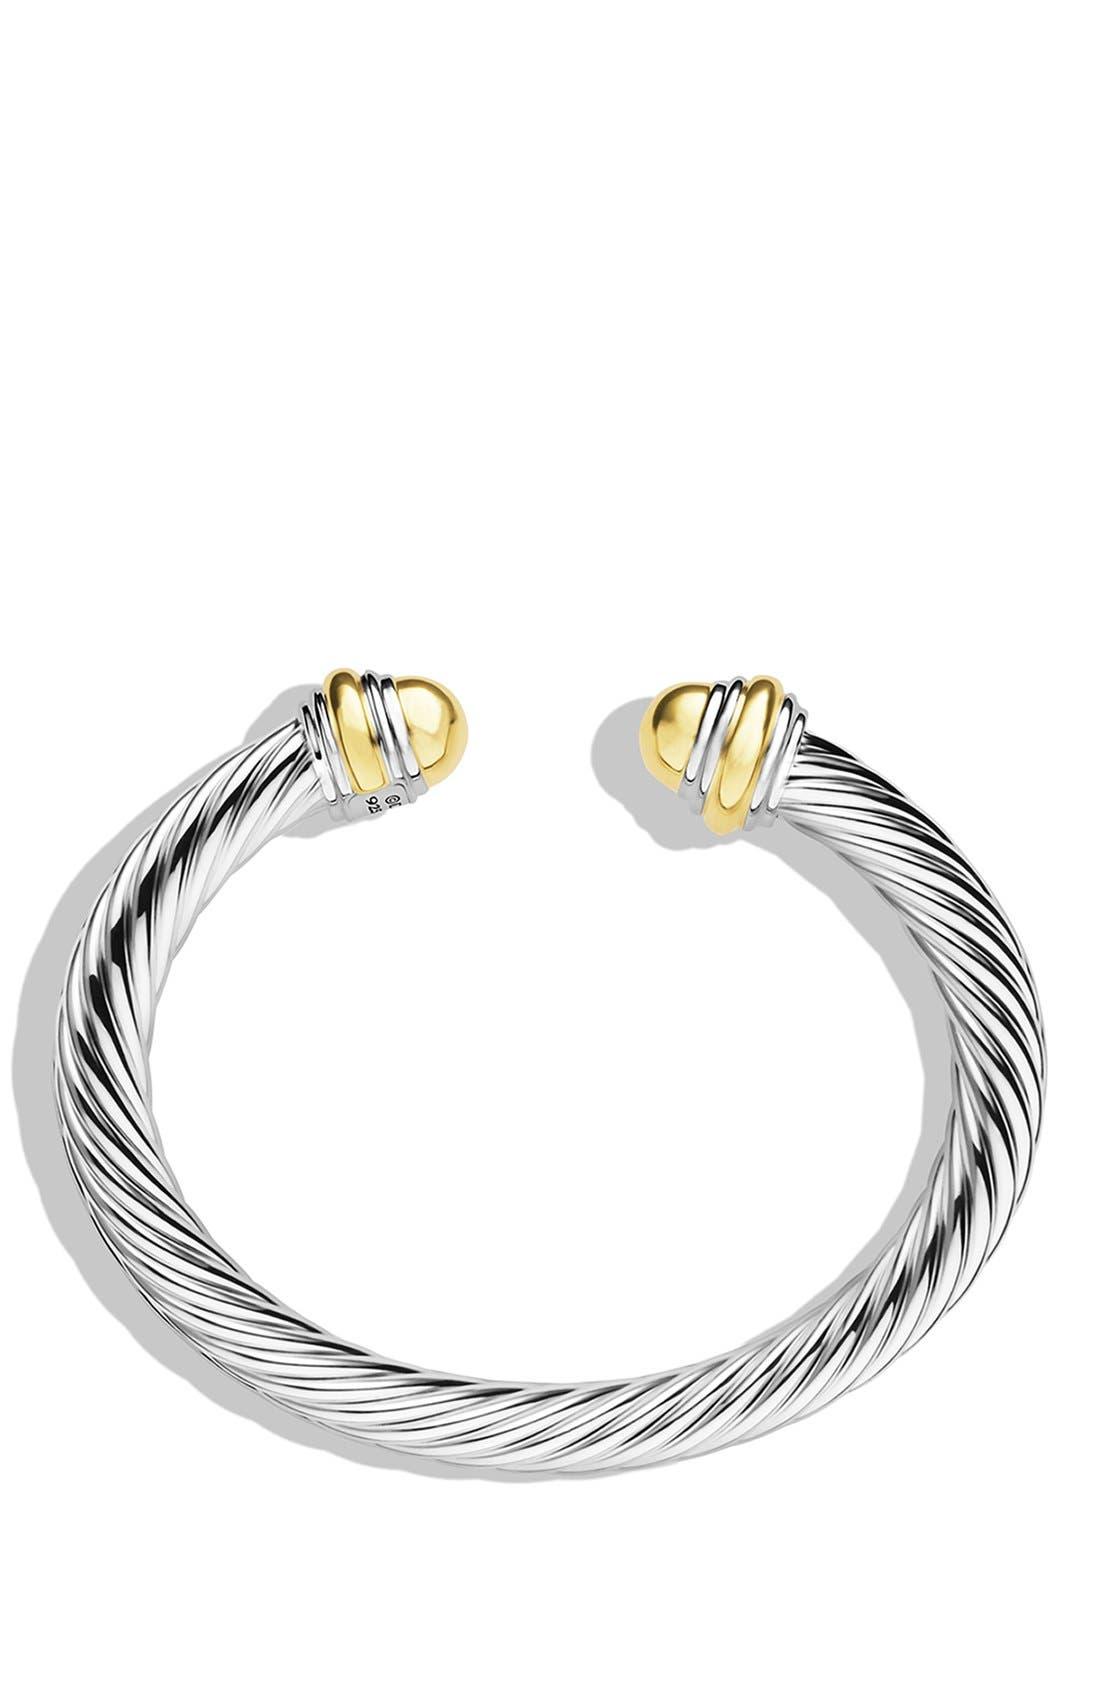 DAVID YURMAN, Cable Classics Bracelet with 14K Gold, 7mm, Alternate thumbnail 4, color, GOLD DOME